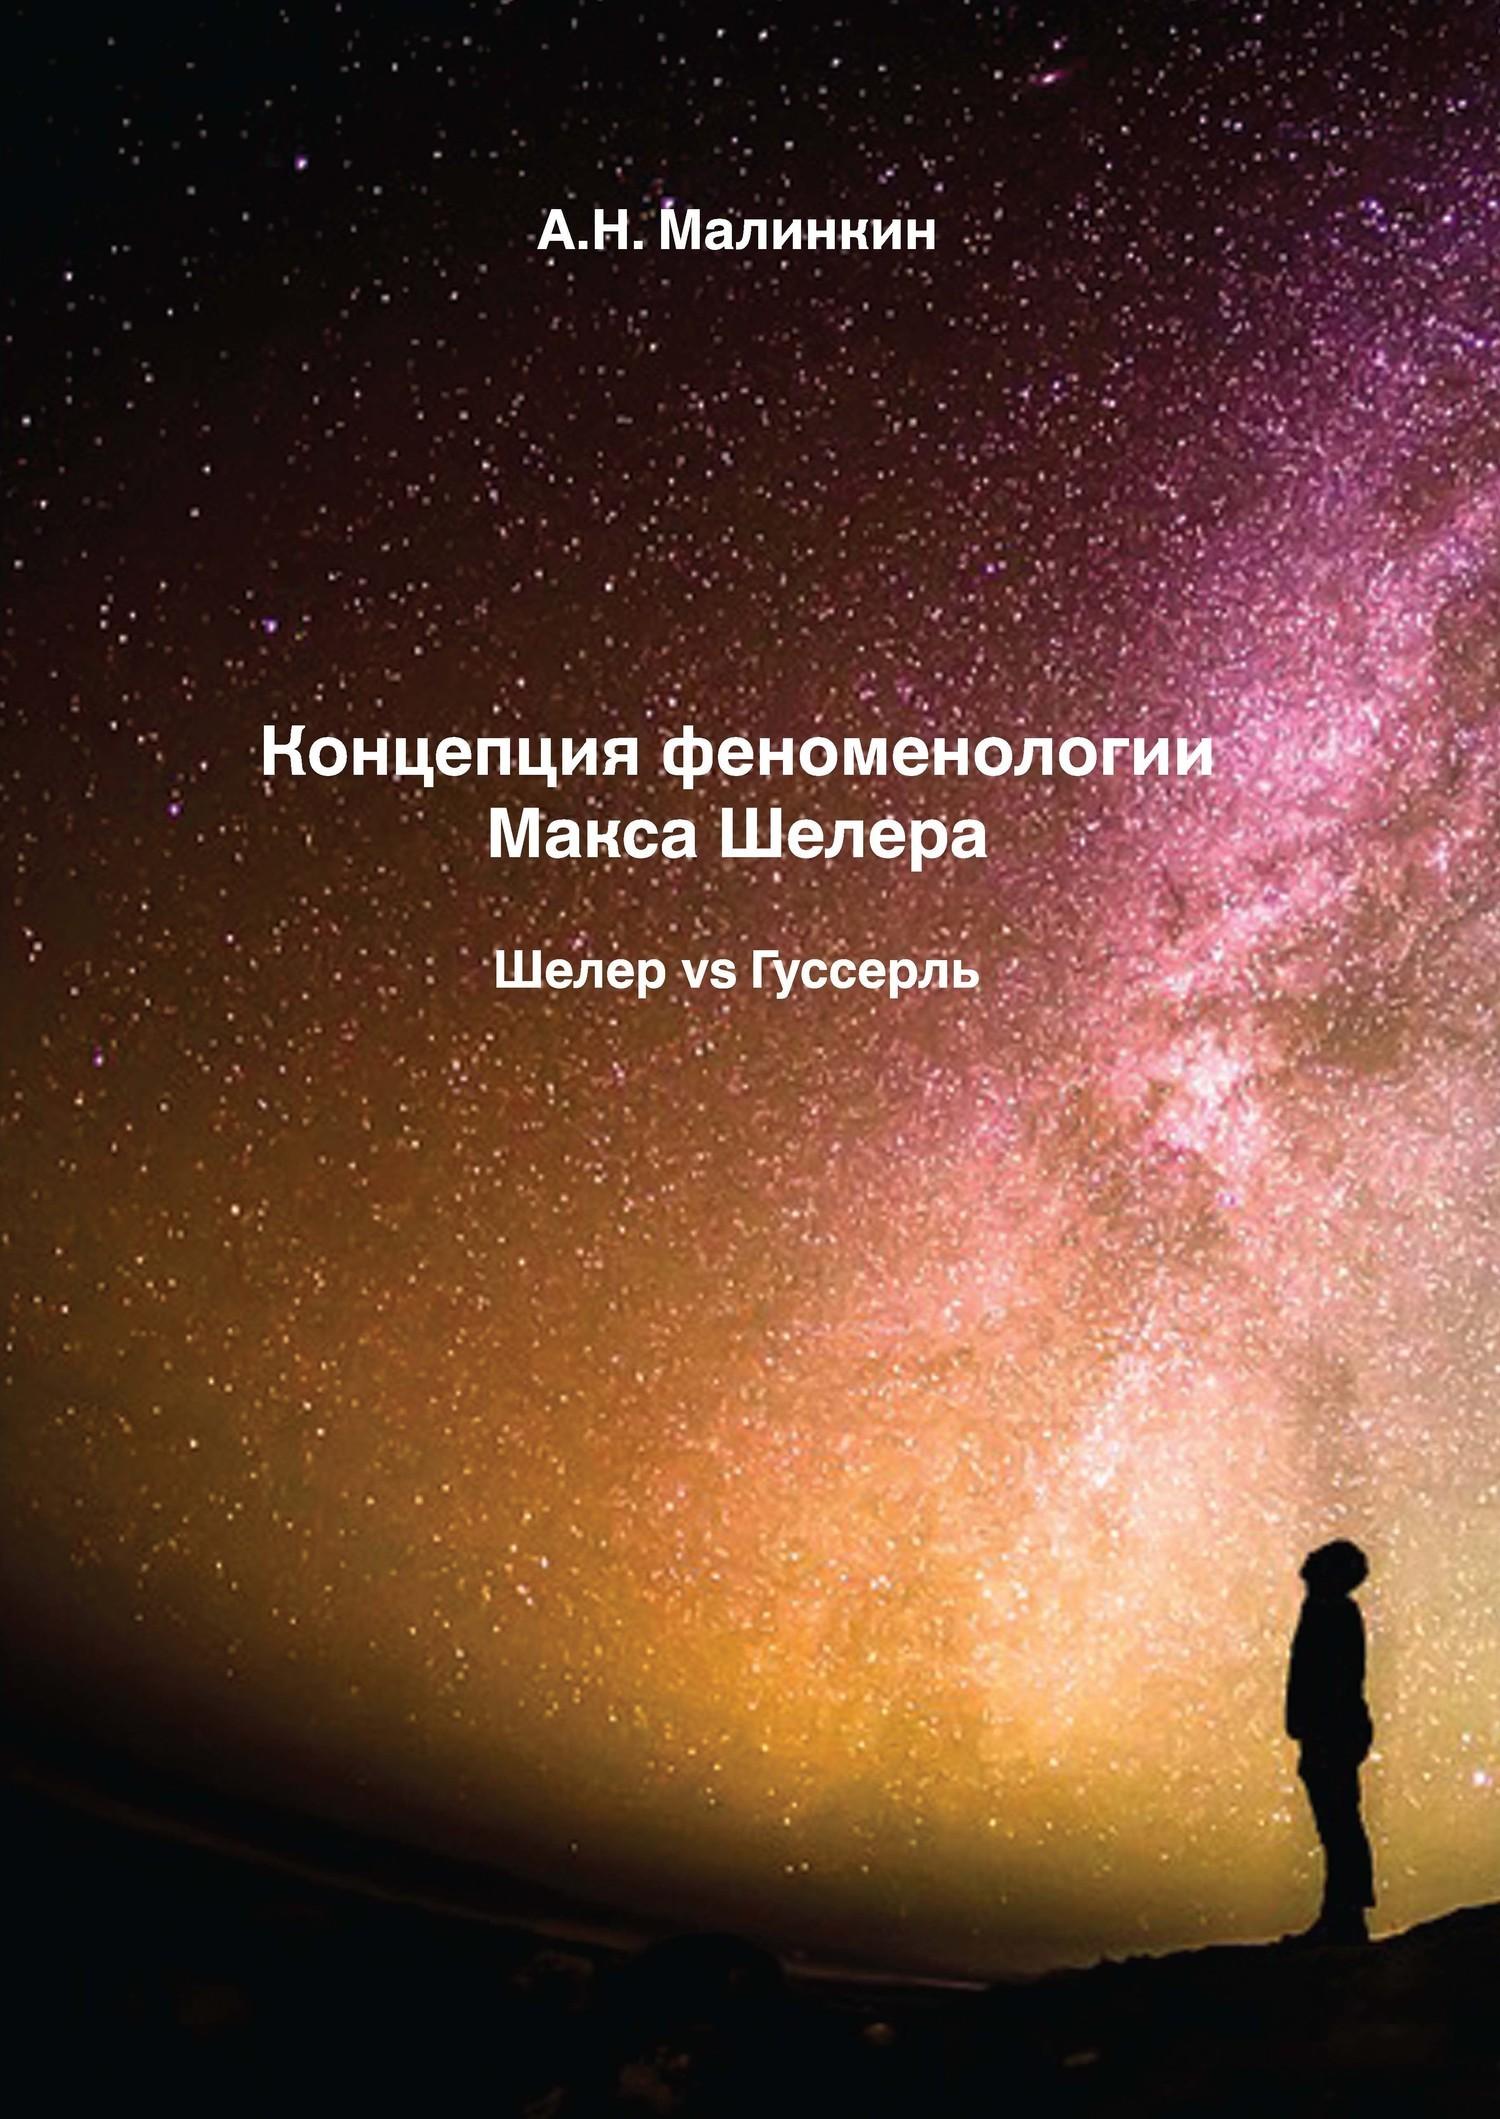 Александр Малинкин - Концепция феноменологии Макса Шелера. Шелер vs Гуссерль